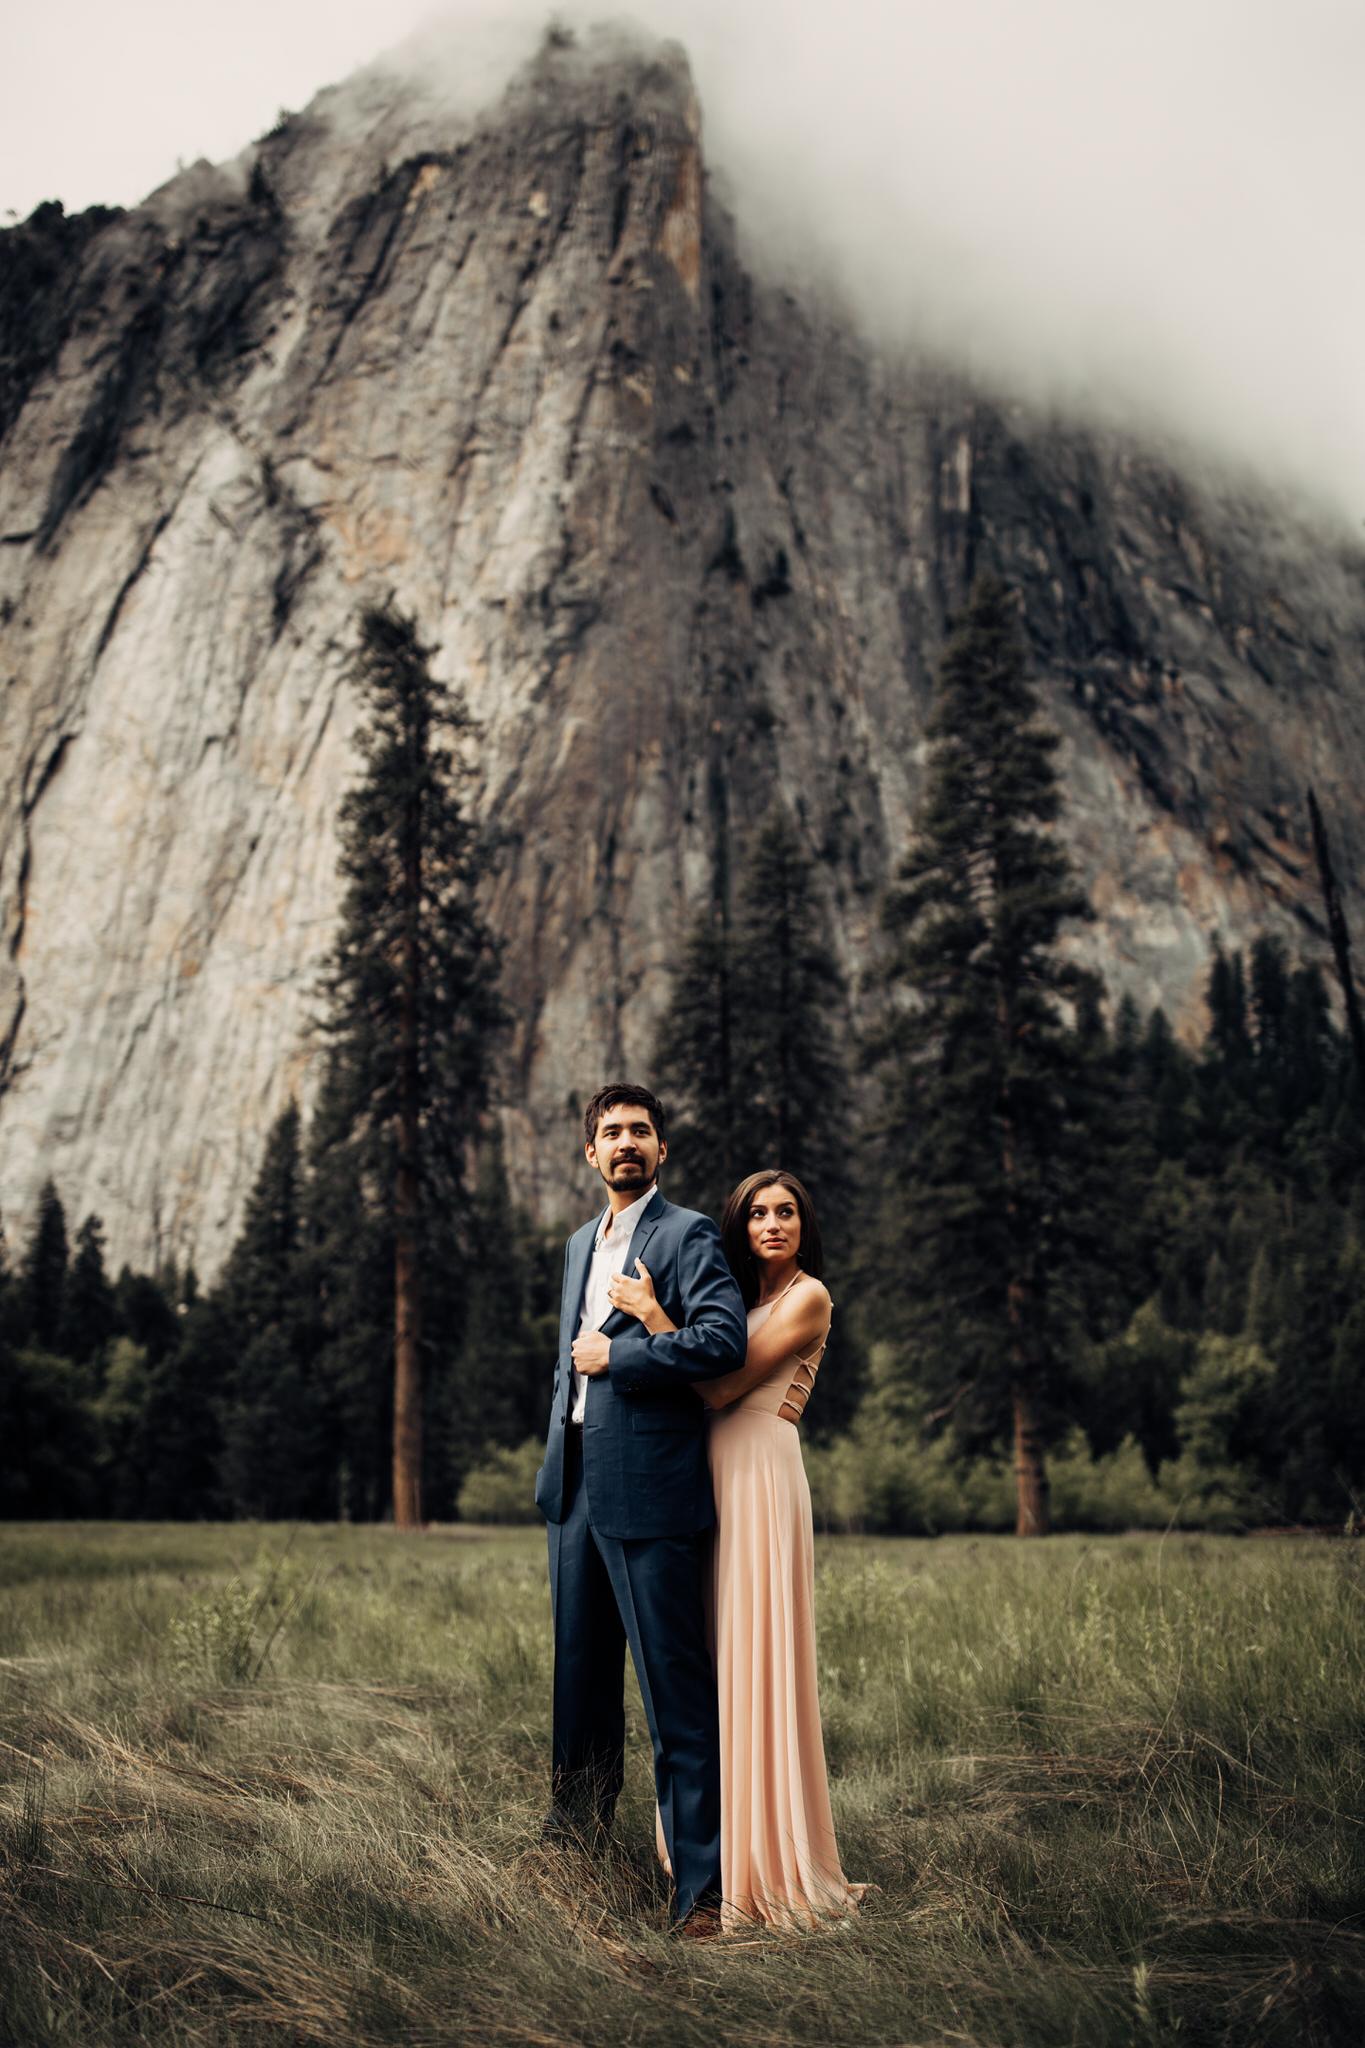 Yosemite-engagement-session-lauren-and-tom73.jpg